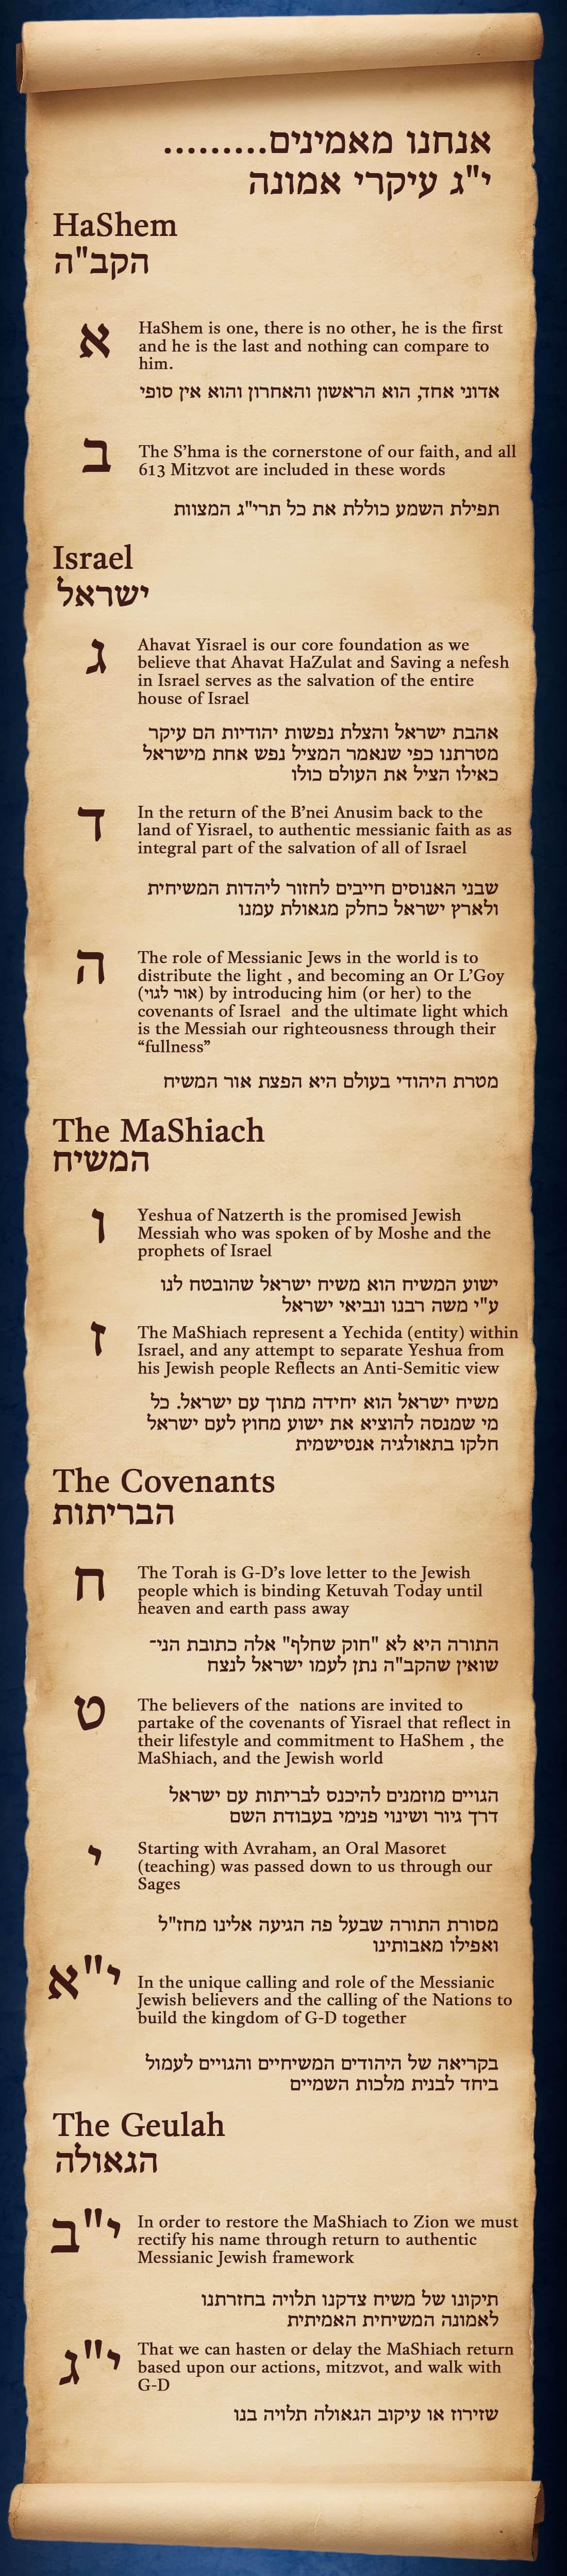 img_shuvu_statement_of_faith_ENG